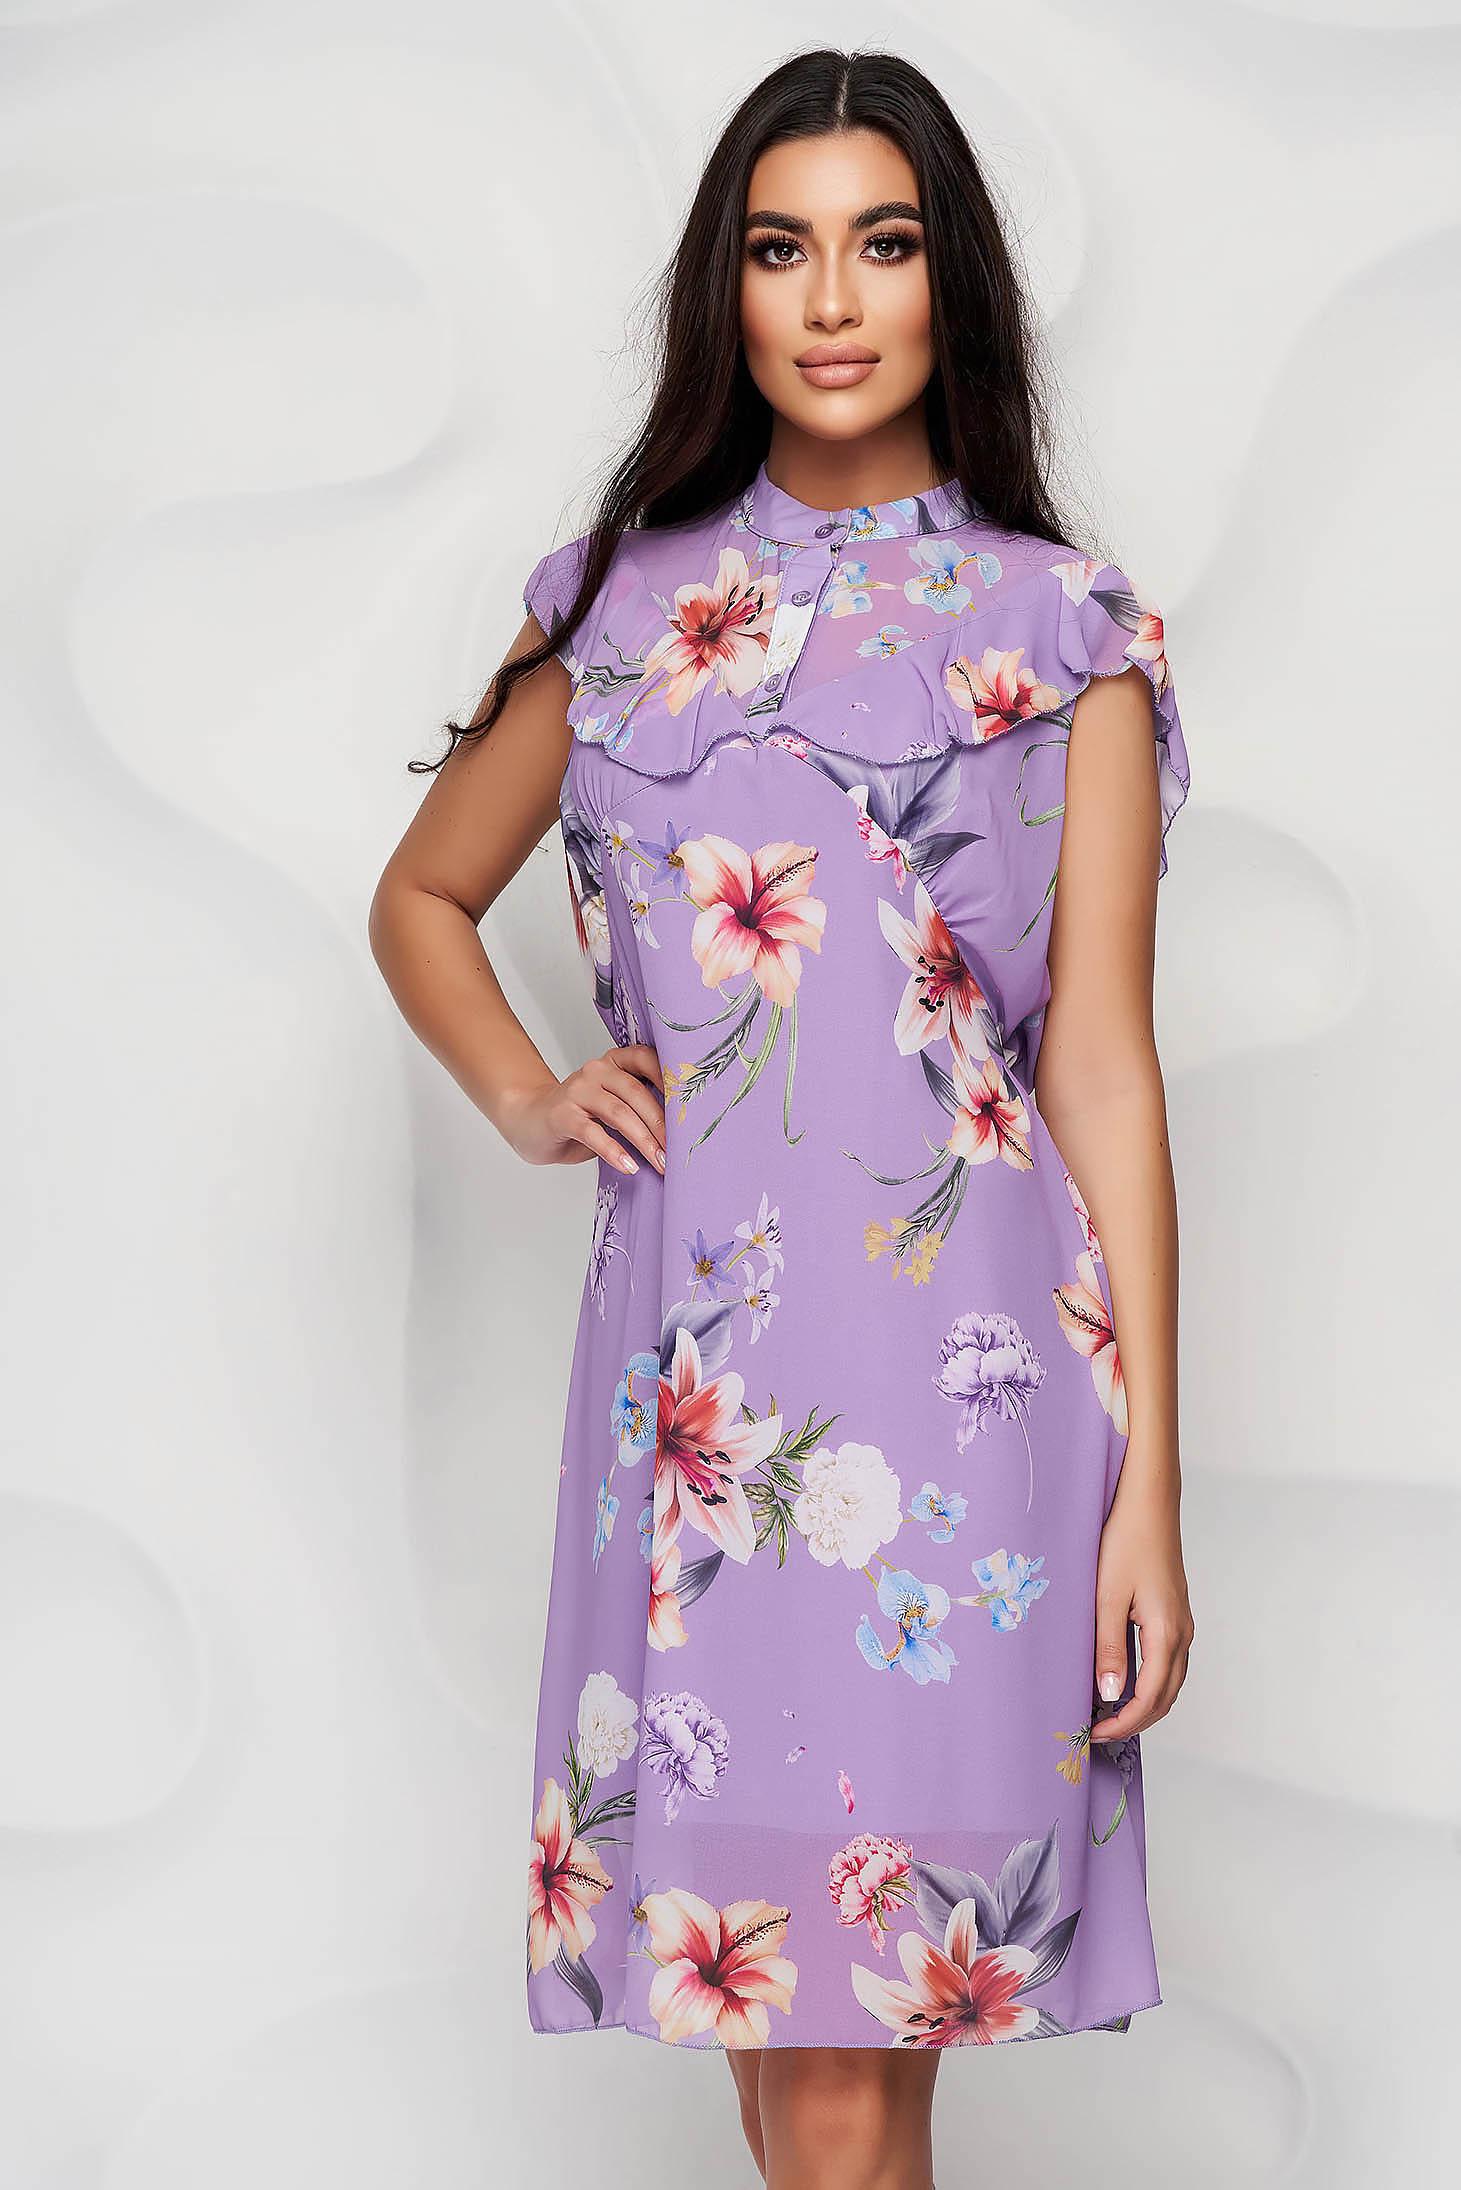 Dress midi straight airy fabric short sleeves